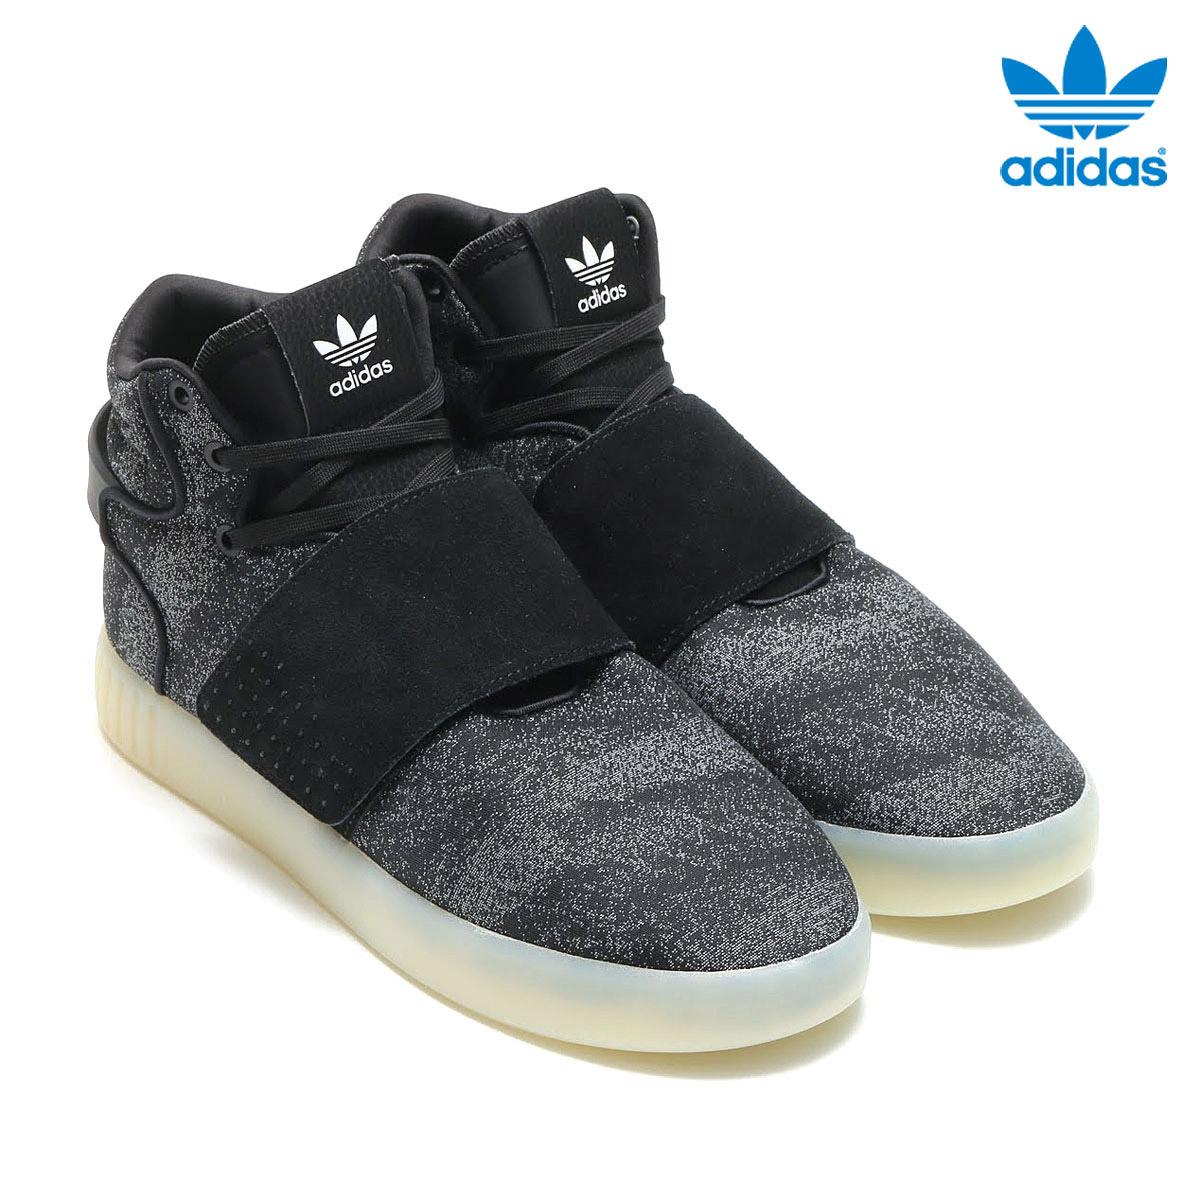 Adidas Jc